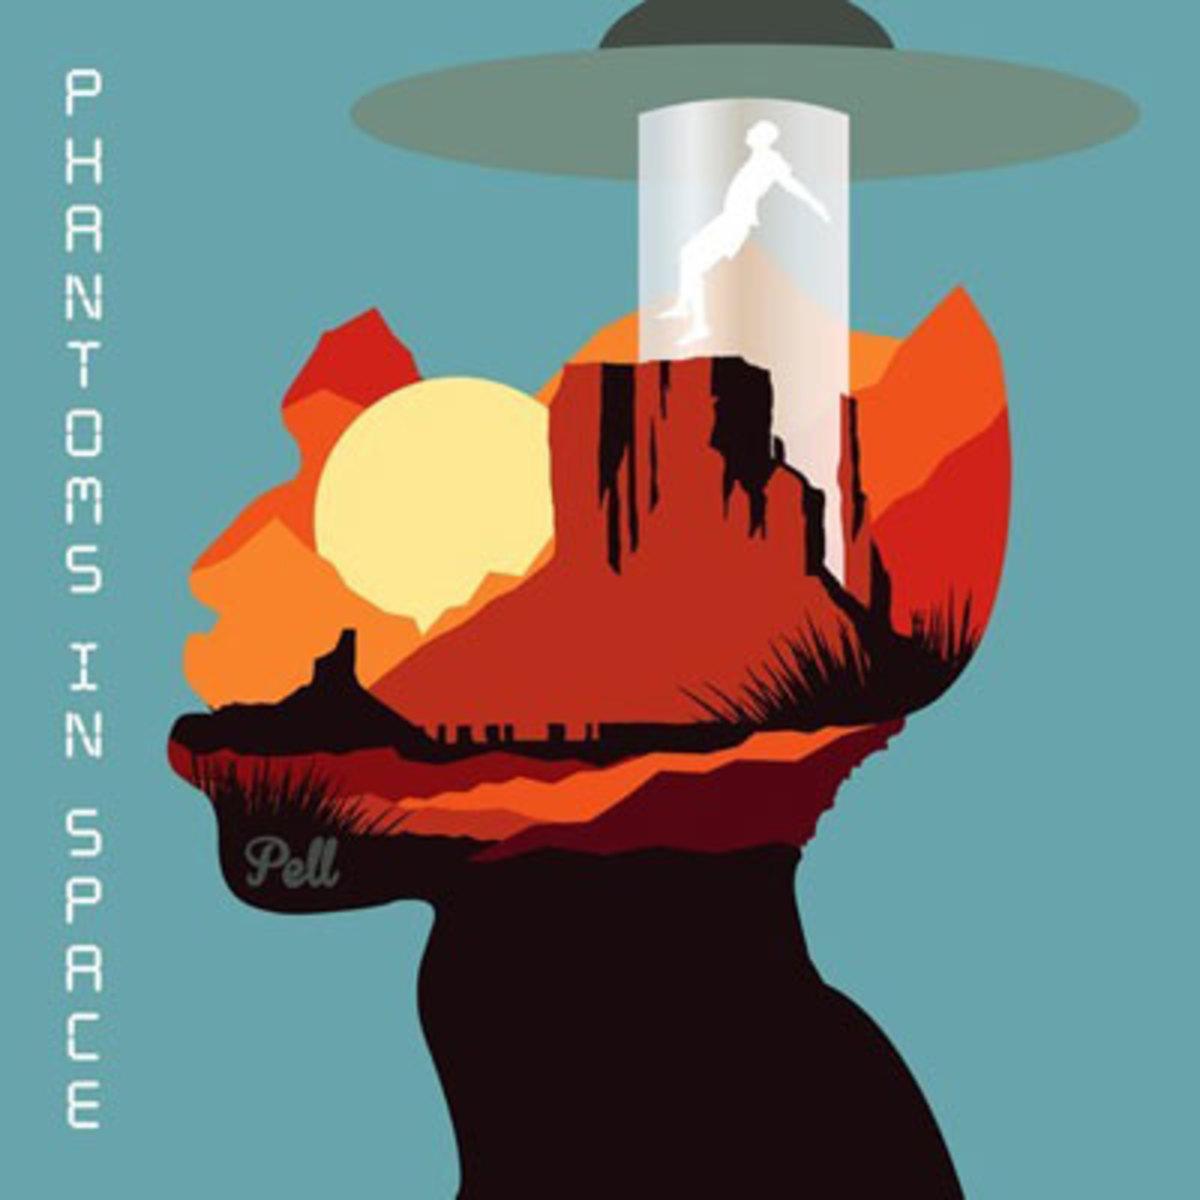 pell-phantomsinspace.jpg